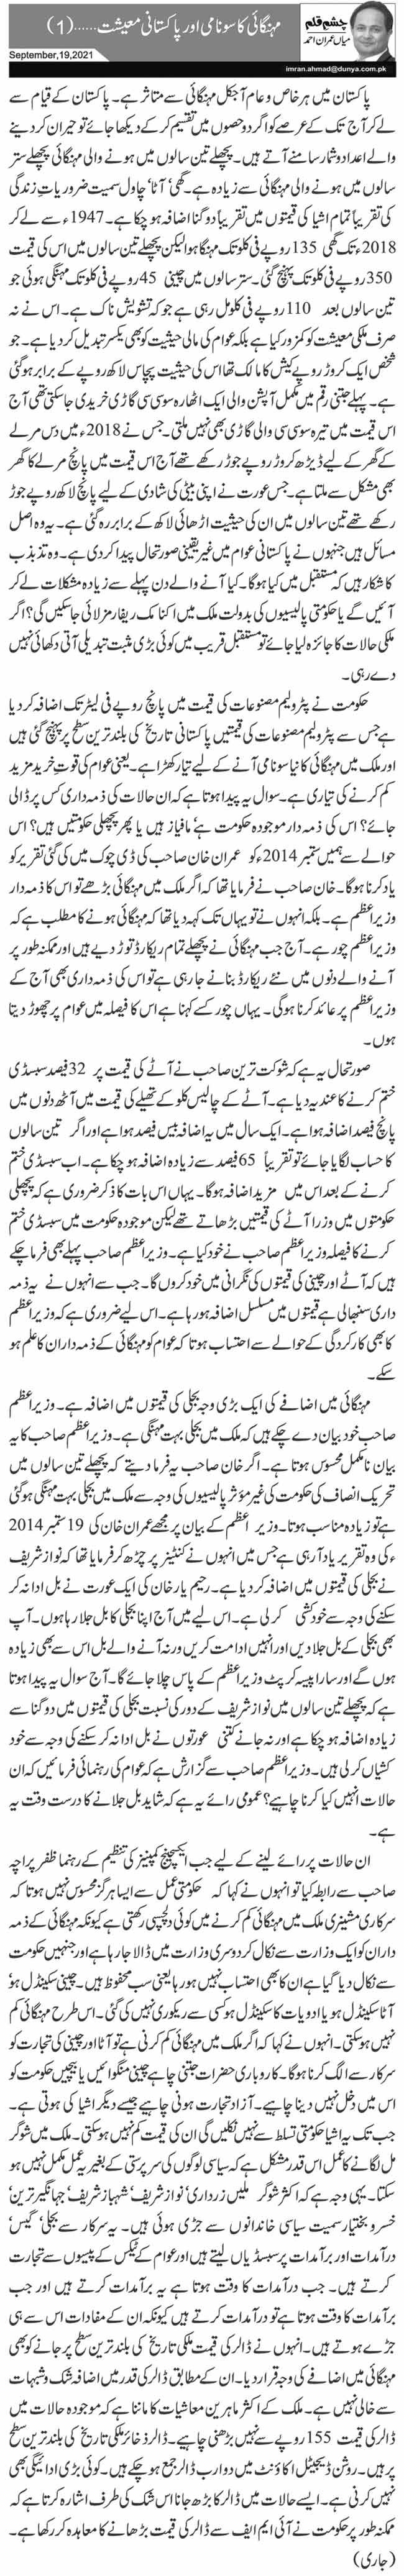 مہنگائی کا سونامی اور پاکستانی معیشت… ( 1)